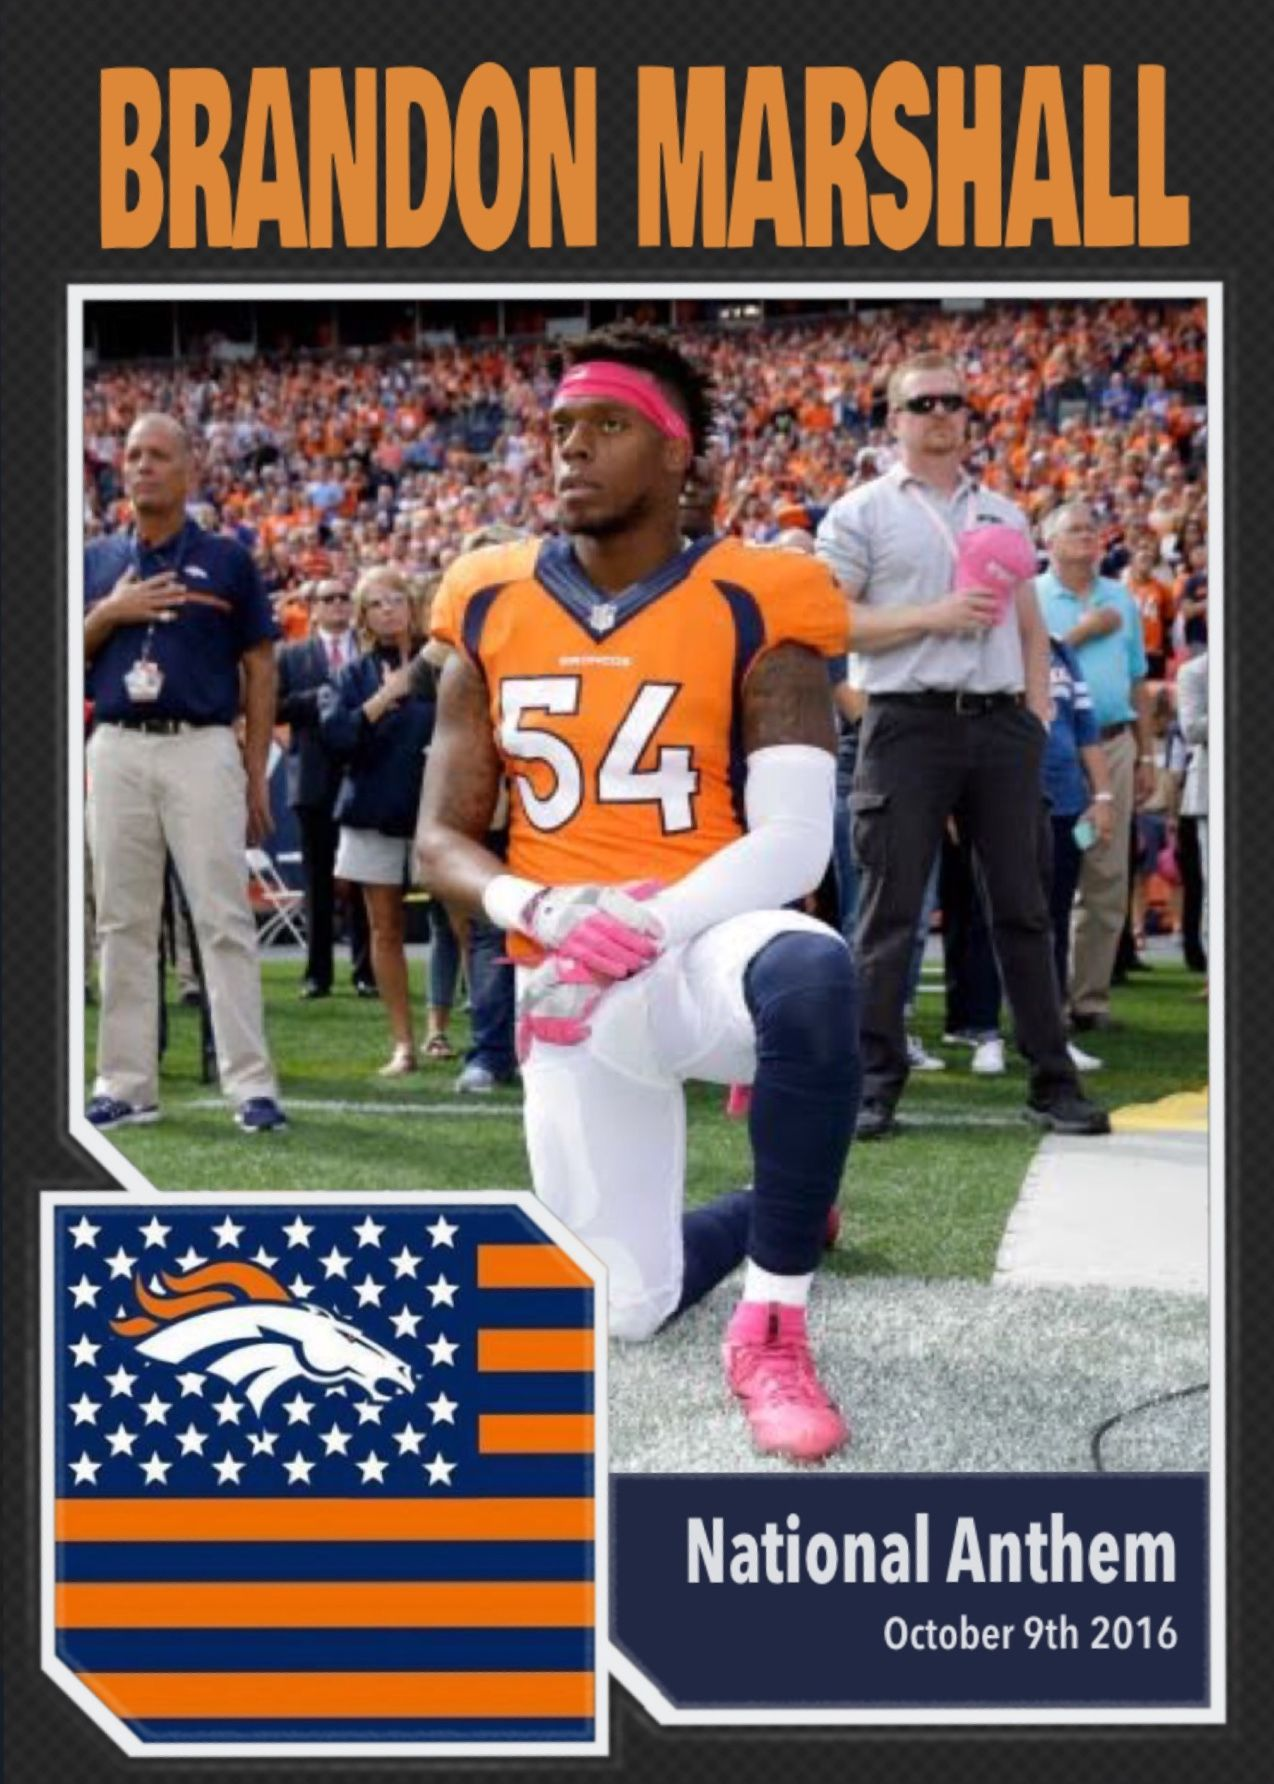 Denver Broncos Inside Linebacker Brandon Marshall 54 Kneels During The National Anthem Prior To An Nfl Footb Nfl Football Games Brandon Marshall Nfl Football